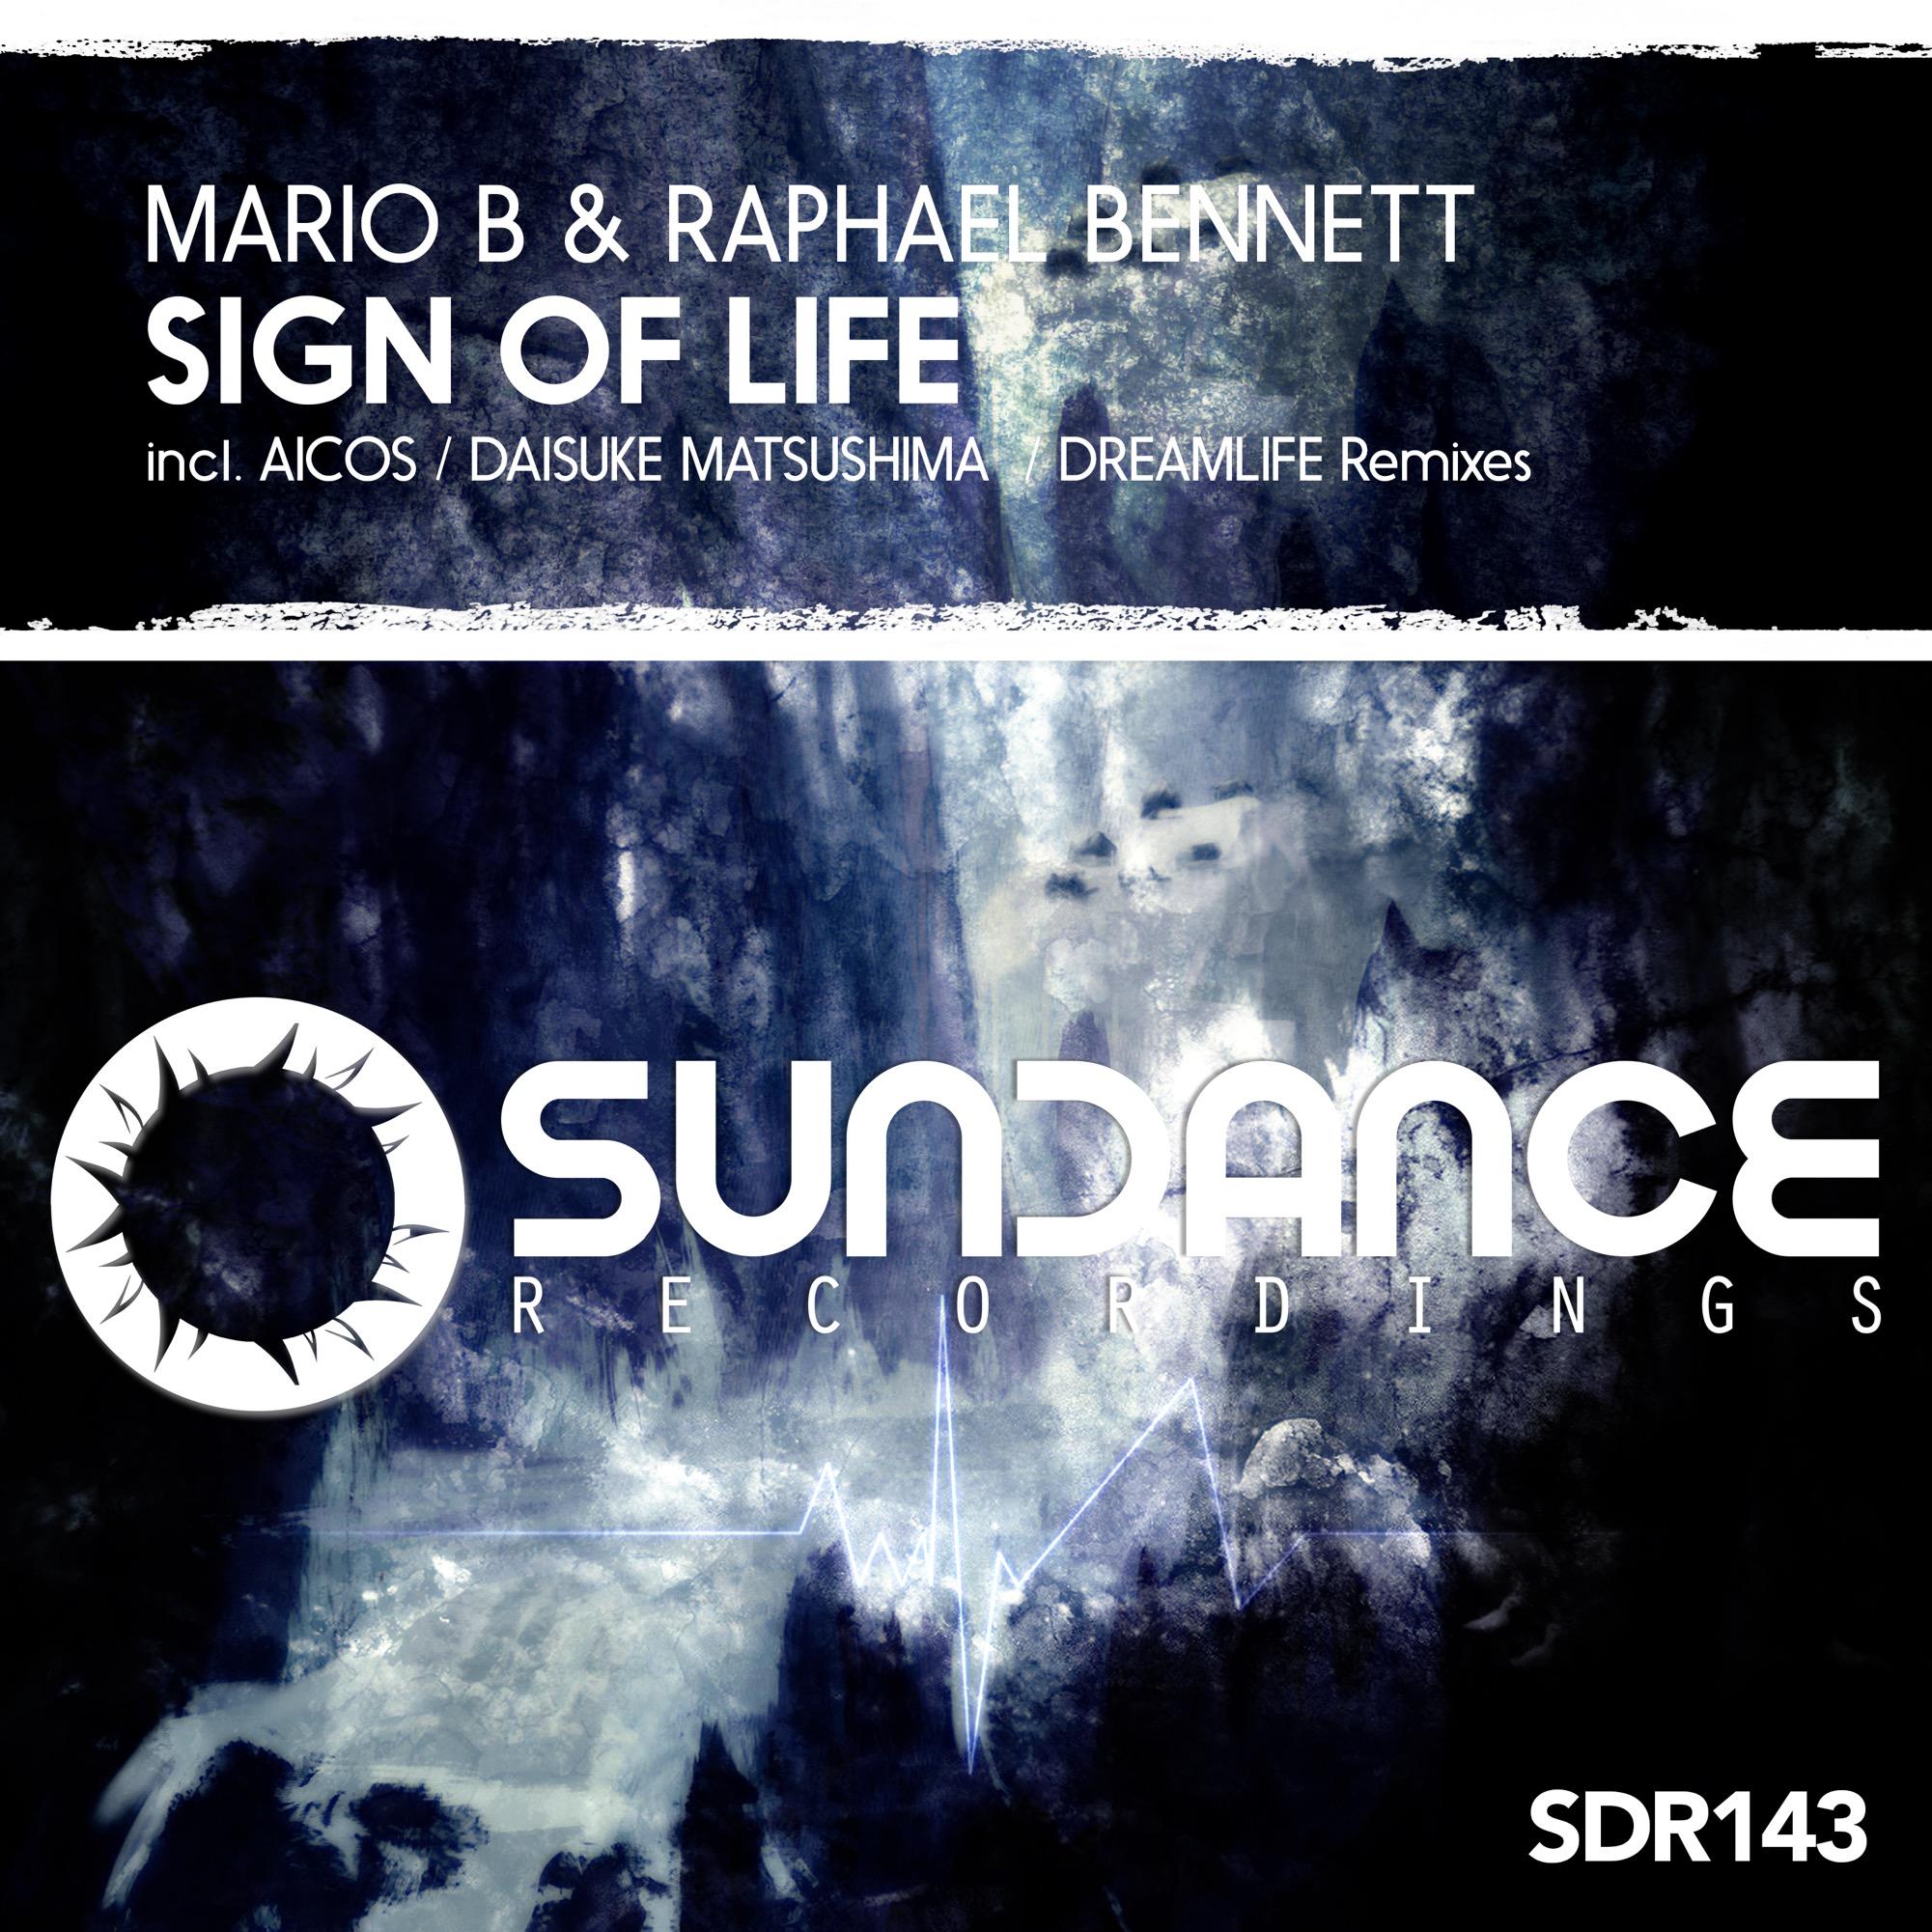 Mario B & Raphael Bennett - Sign Of Life (DreamLife Remix)